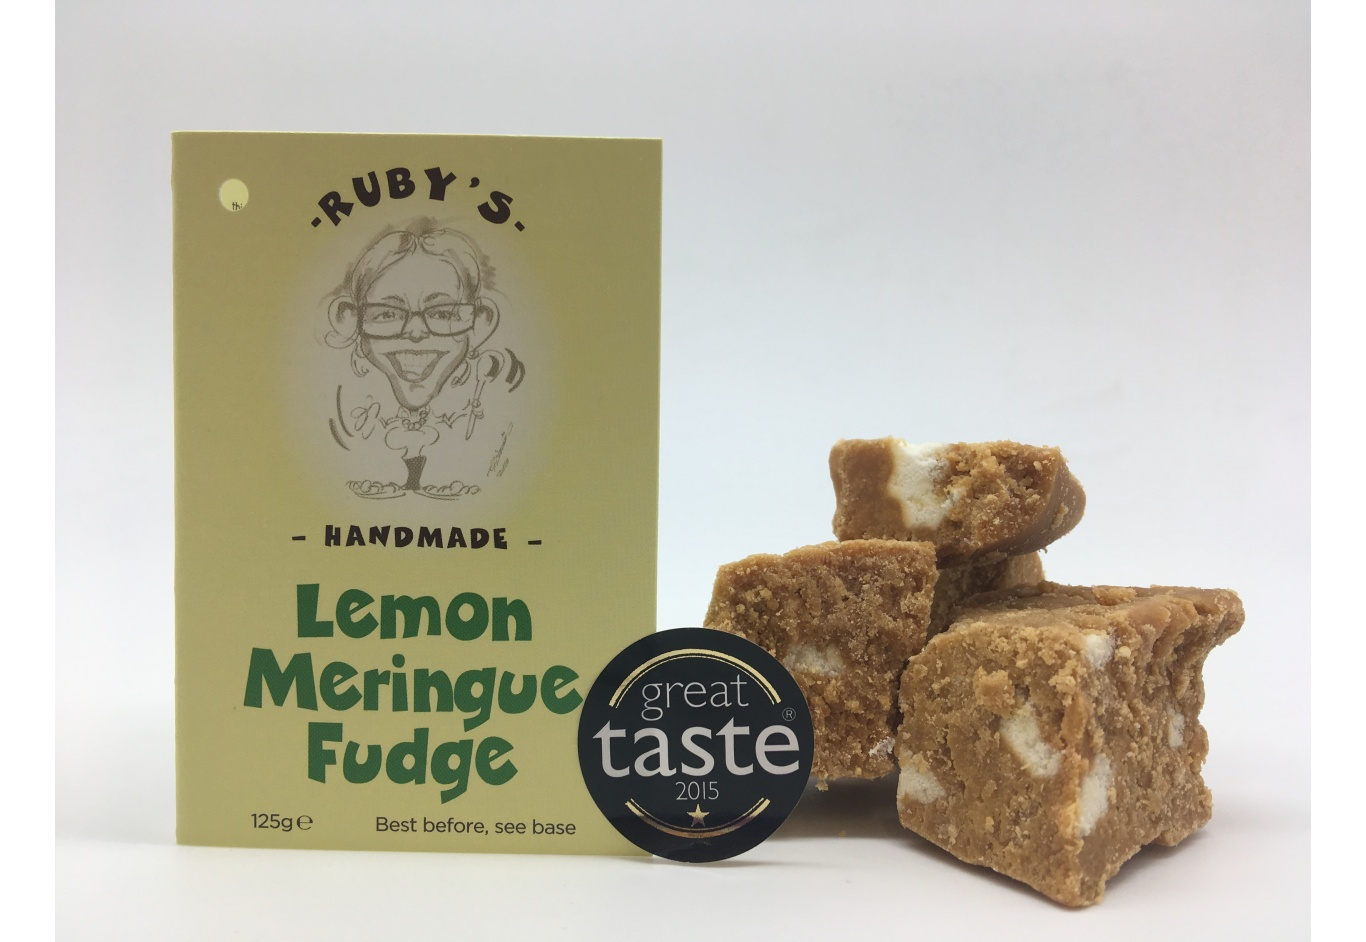 1Kg Box of Lemon Meringue Fudge